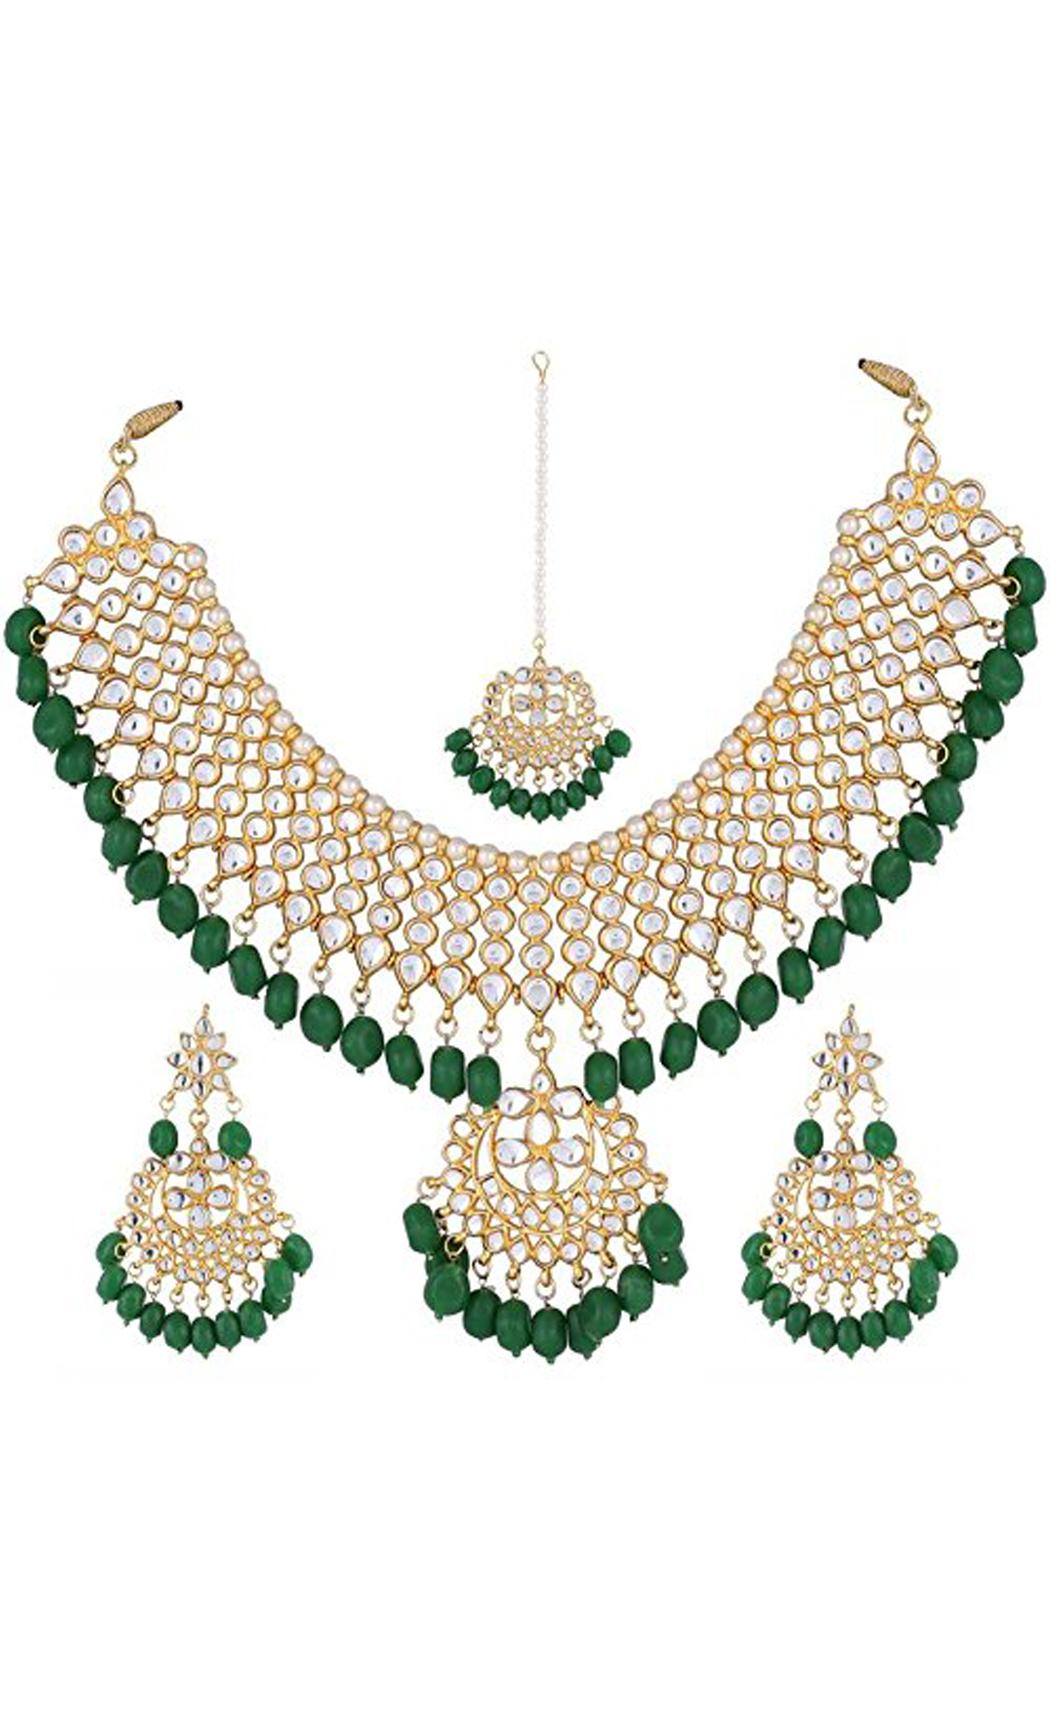 Kundan and Green Stone Neckpiece Earrings and Mangtika Set | Indian Bridal Jewellery Collection | Buy Online